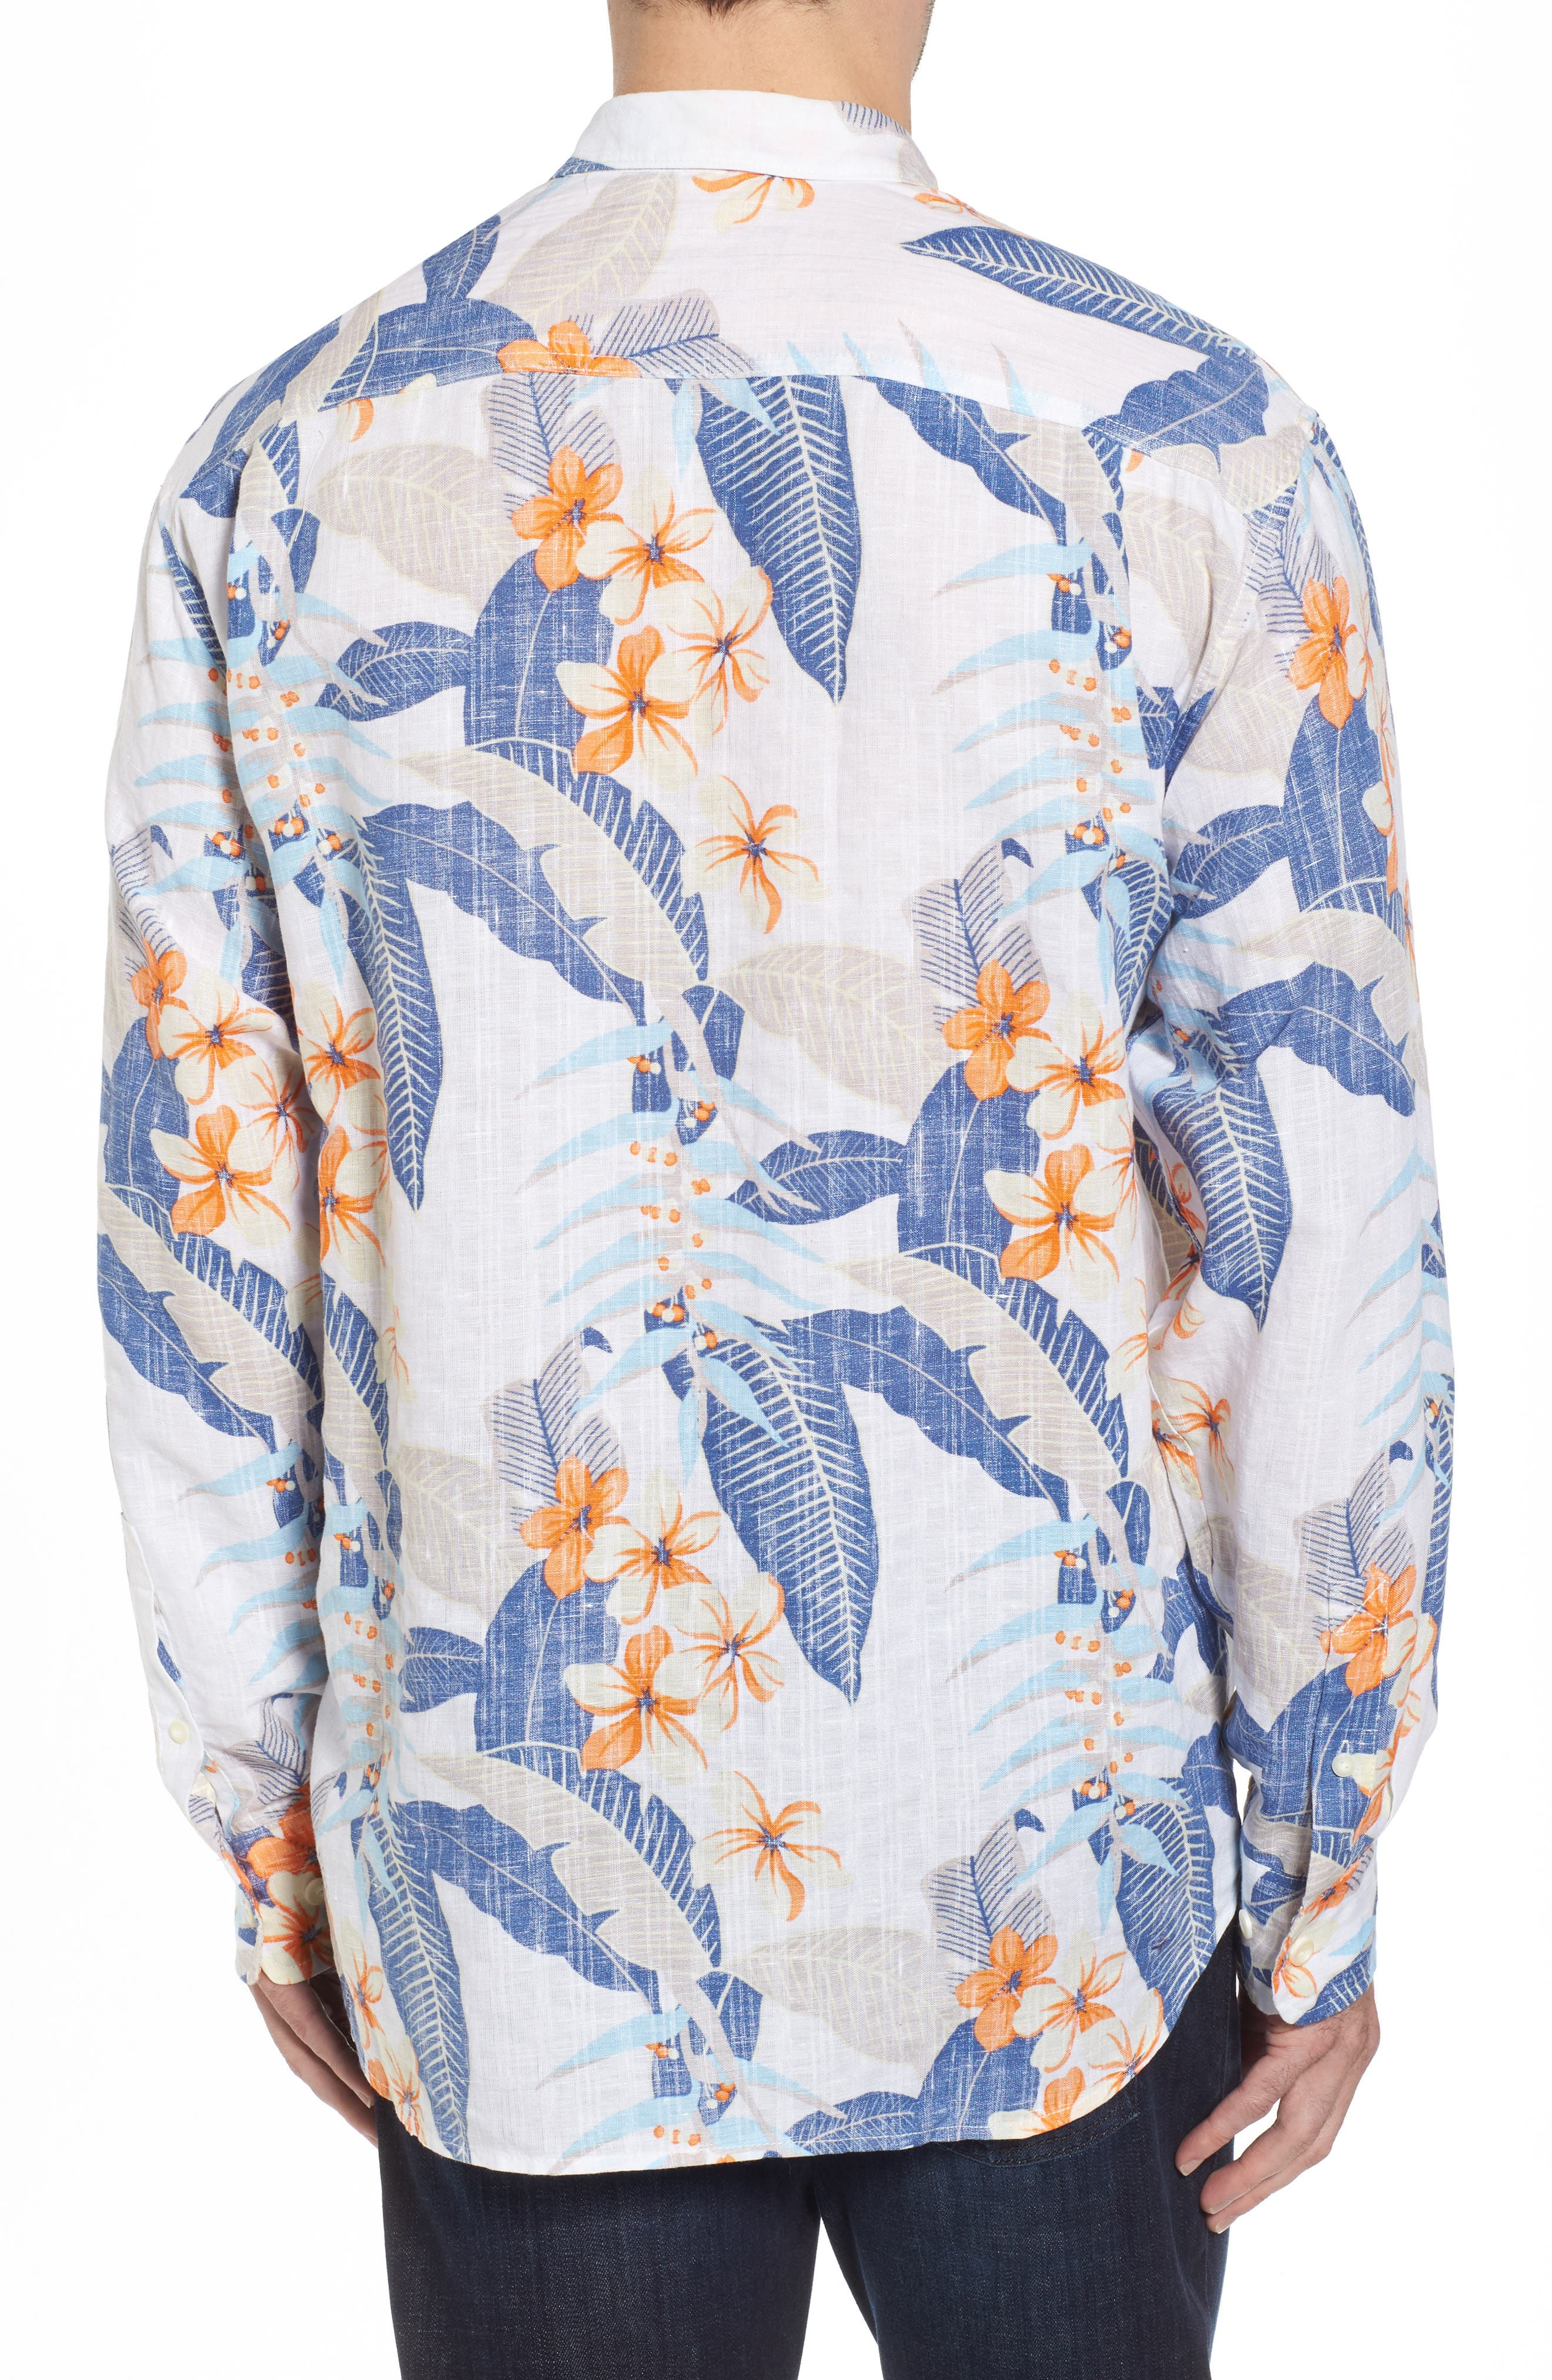 Liviea Leaves Linen Blend Camp Shirt,                             Alternate thumbnail 2, color,